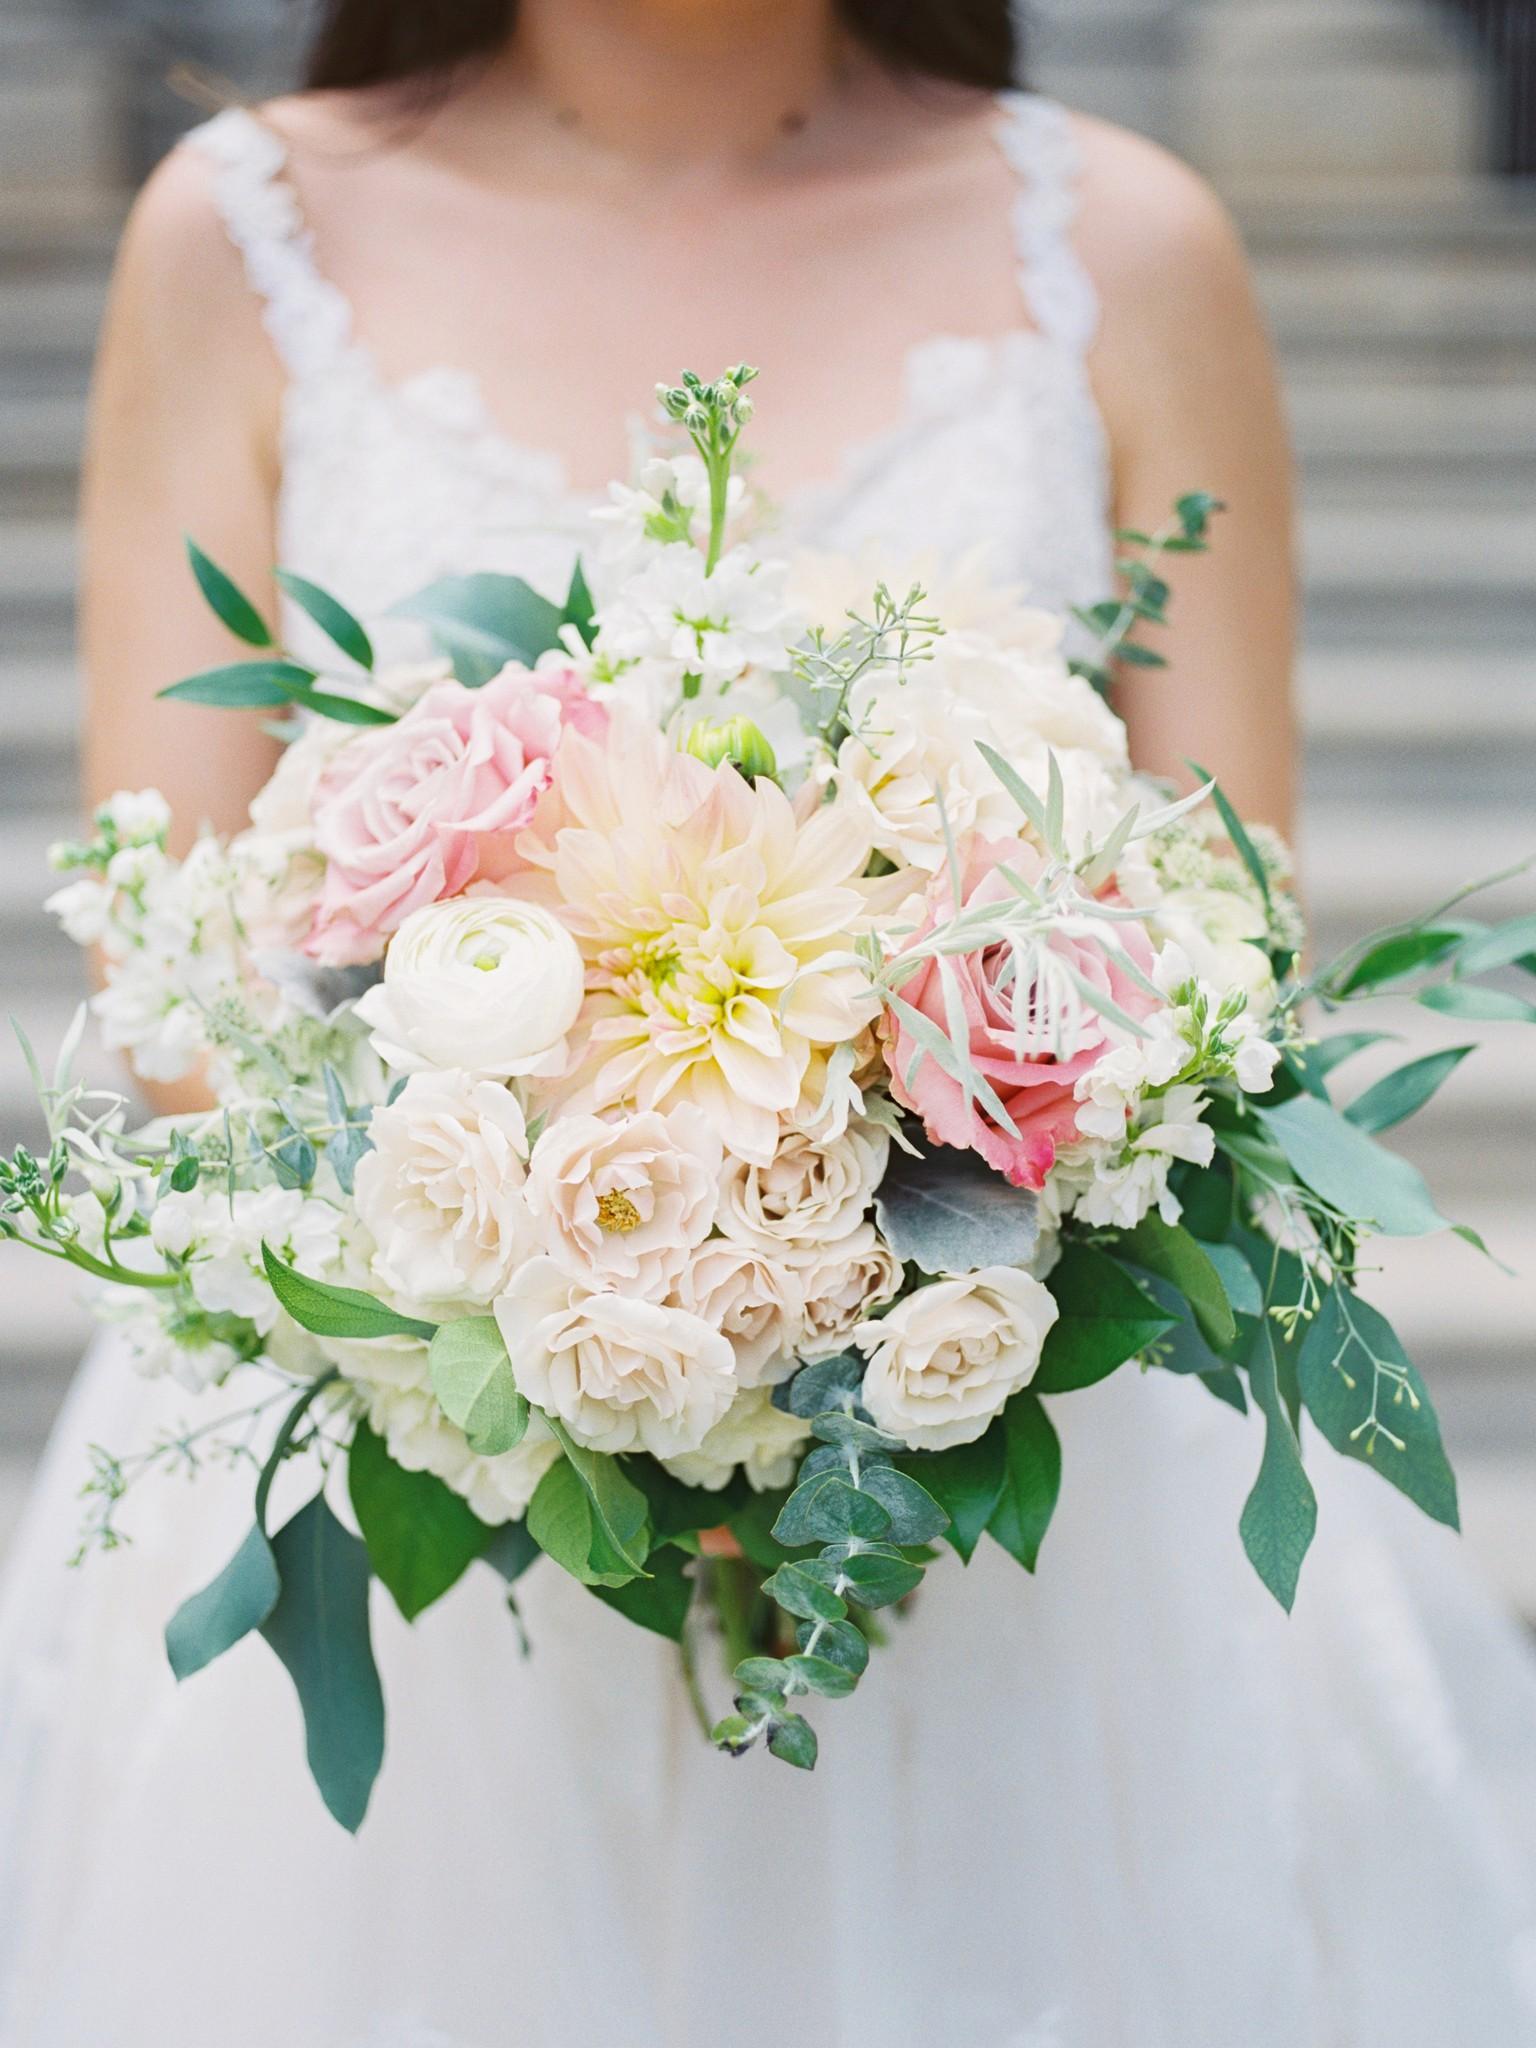 VA-Great-Marsh-Estate-Summer-Wedding-Blush-41.jpg